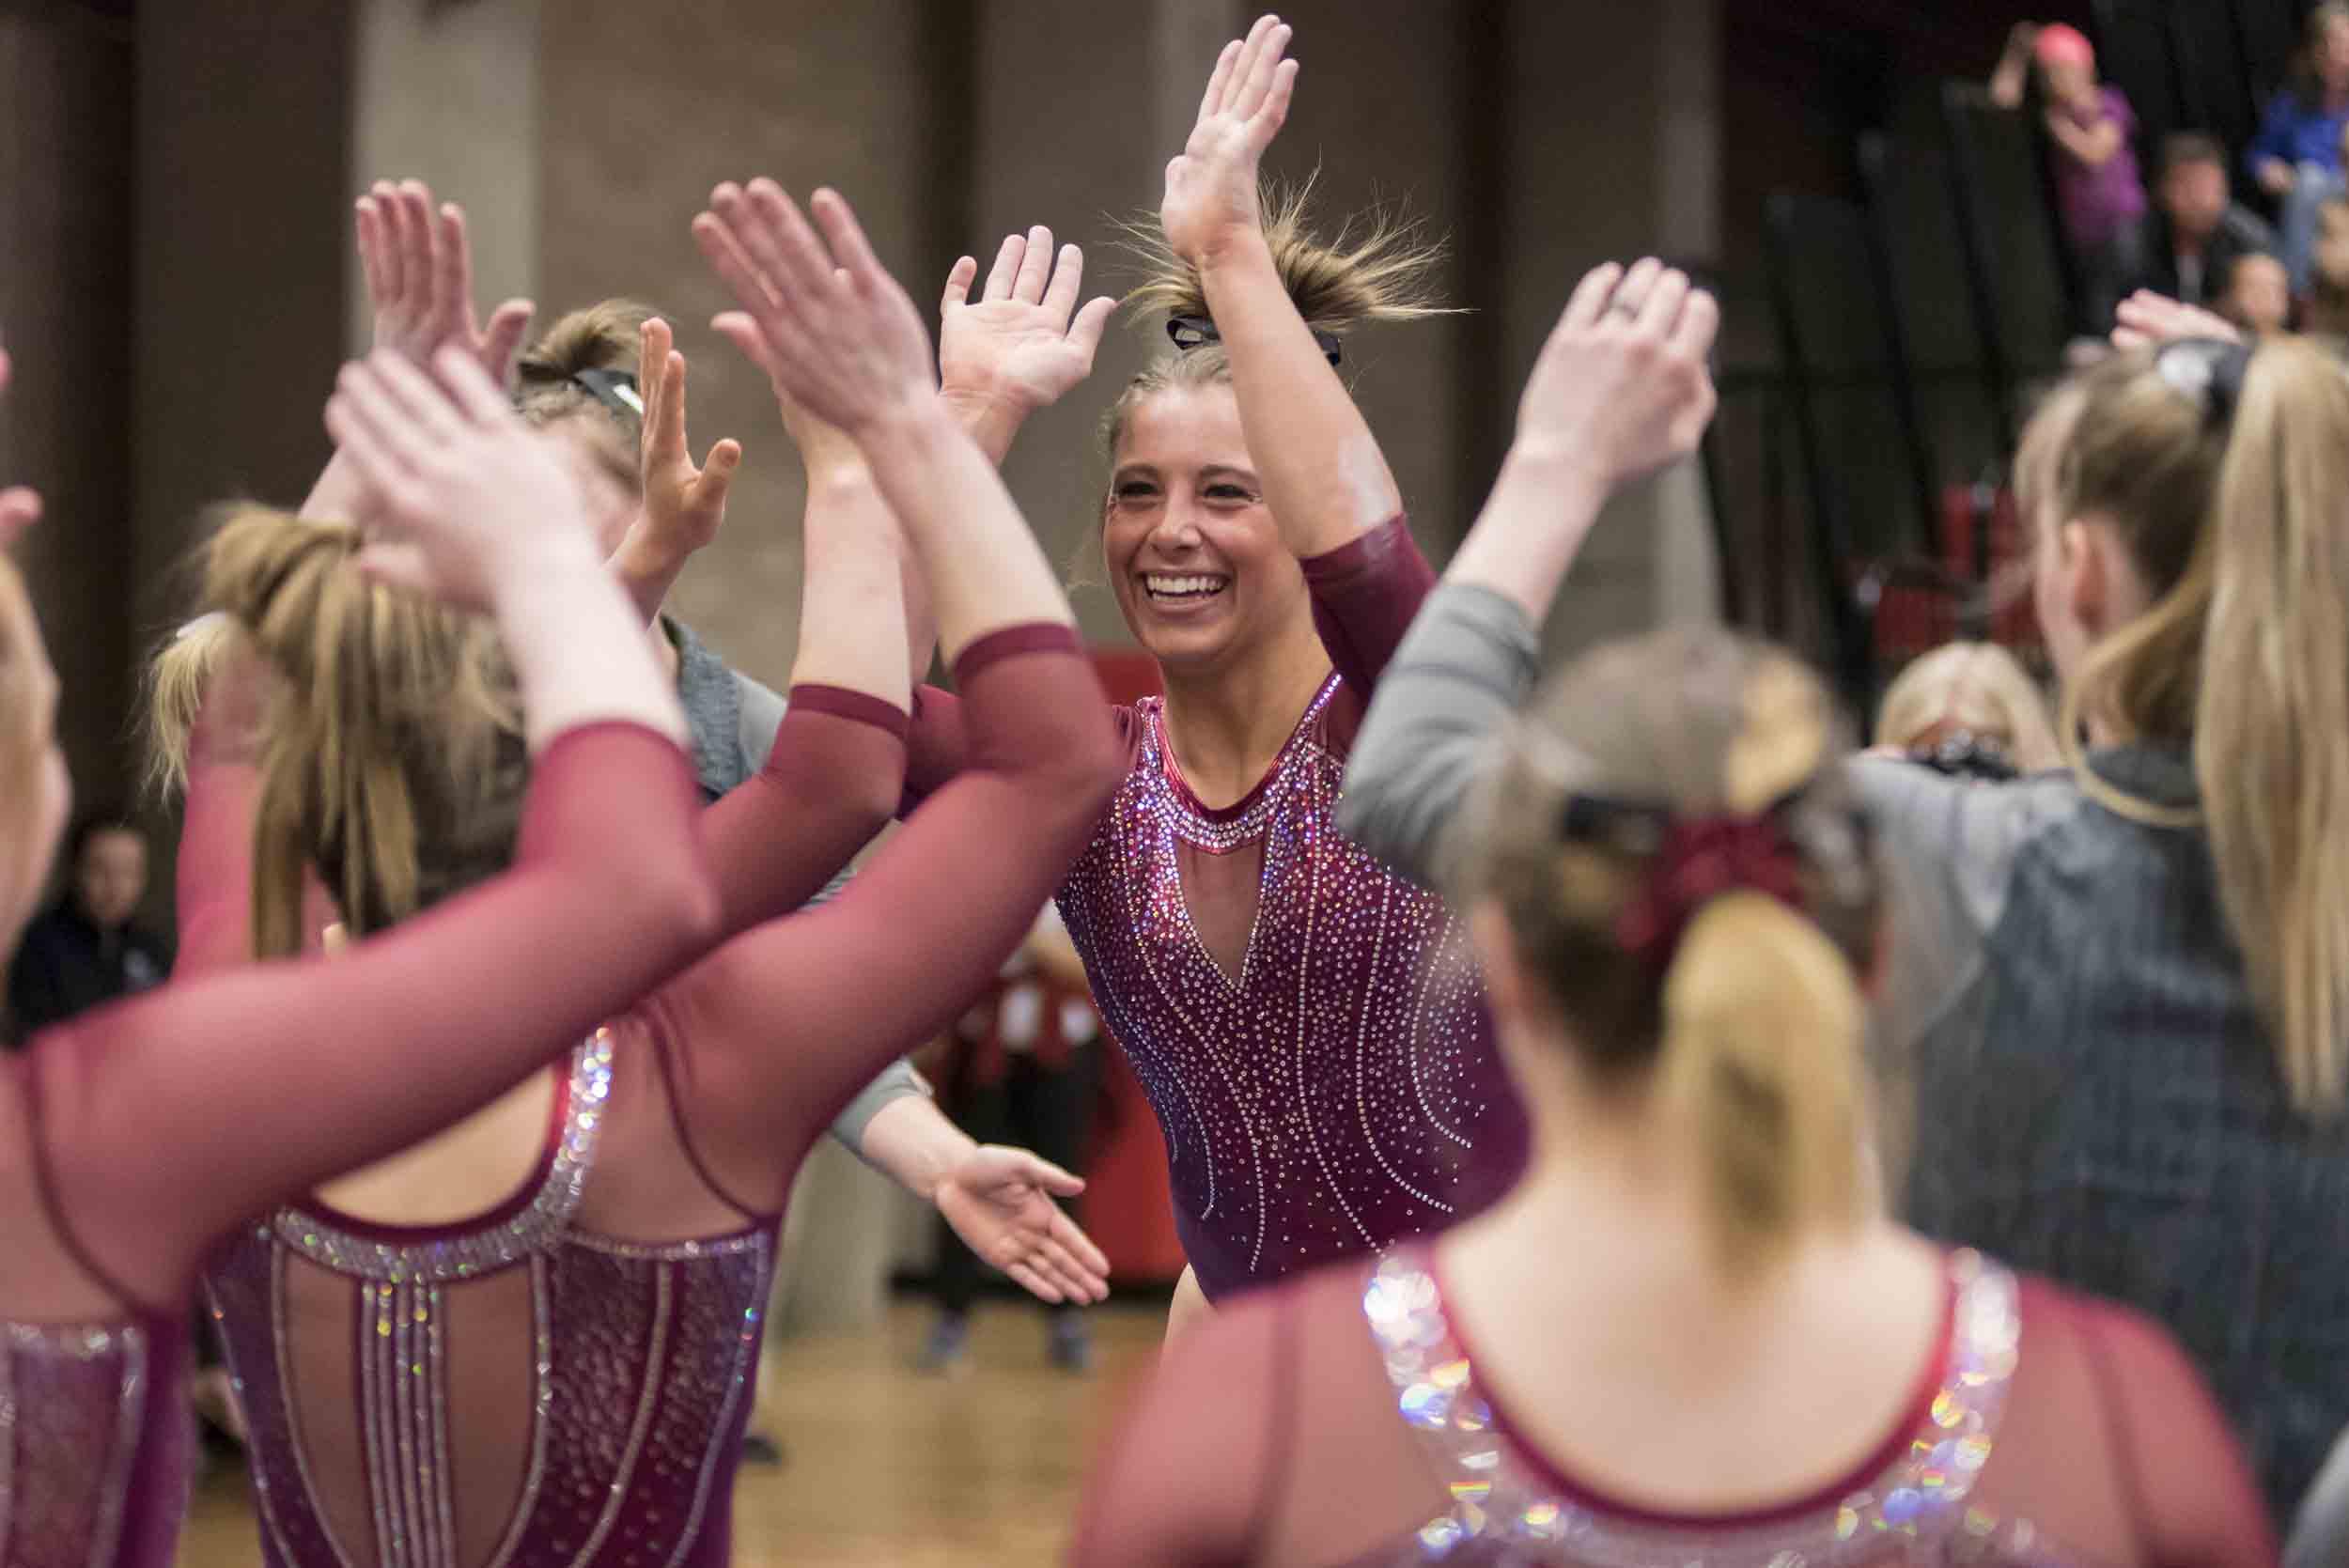 Maddie Karr high-fiving teammates following a routine.